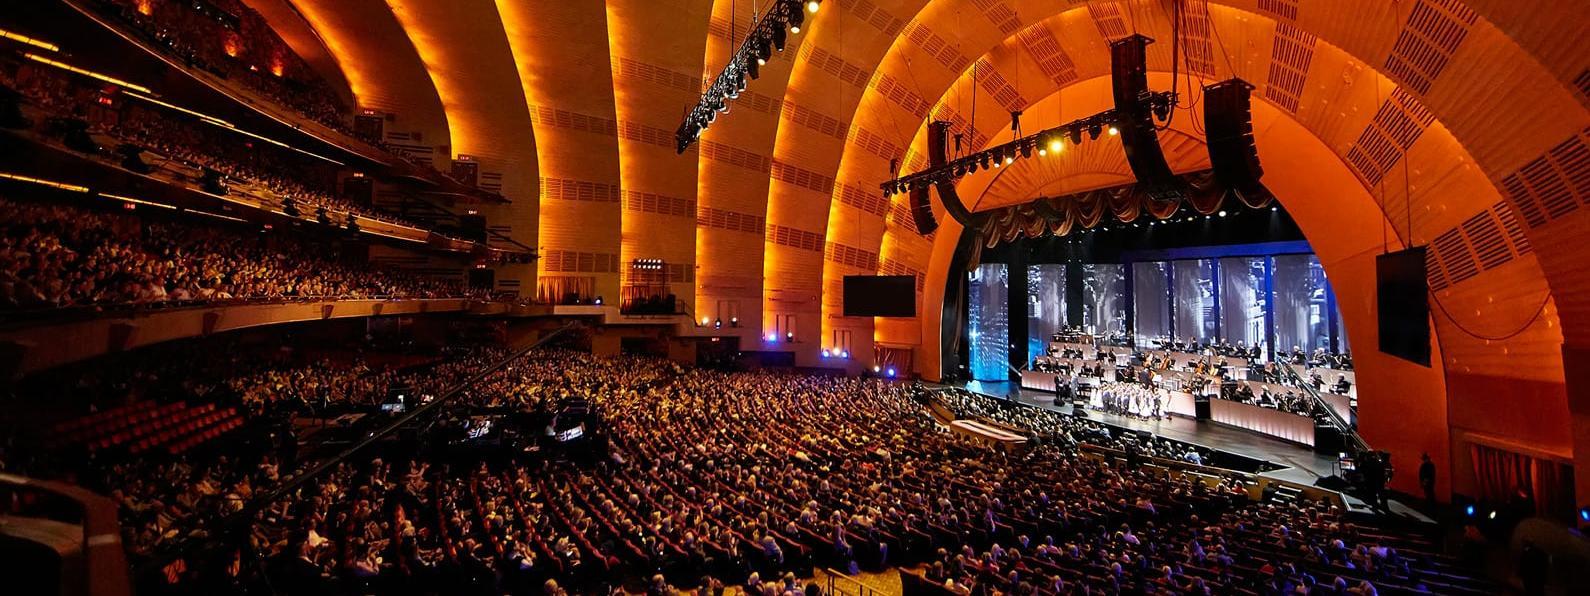 Radio City Music Hall091516_204W-L-1590x890-OPT